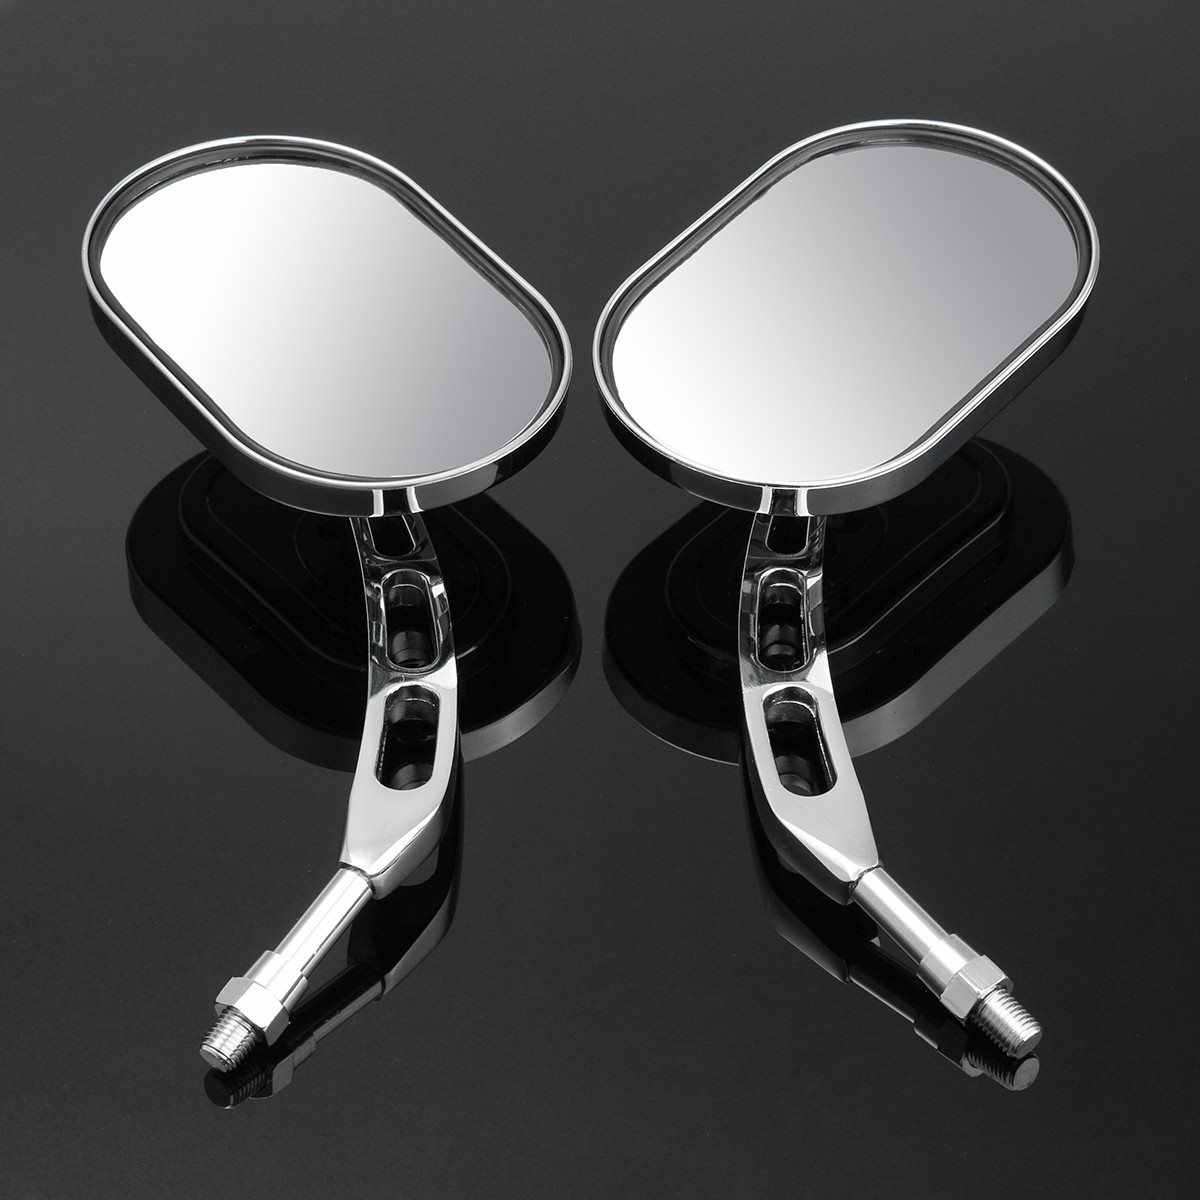 Motor Rear View Mirror Untuk Harley Davidson-/Softail/Springer/Heritage/Electra Glide